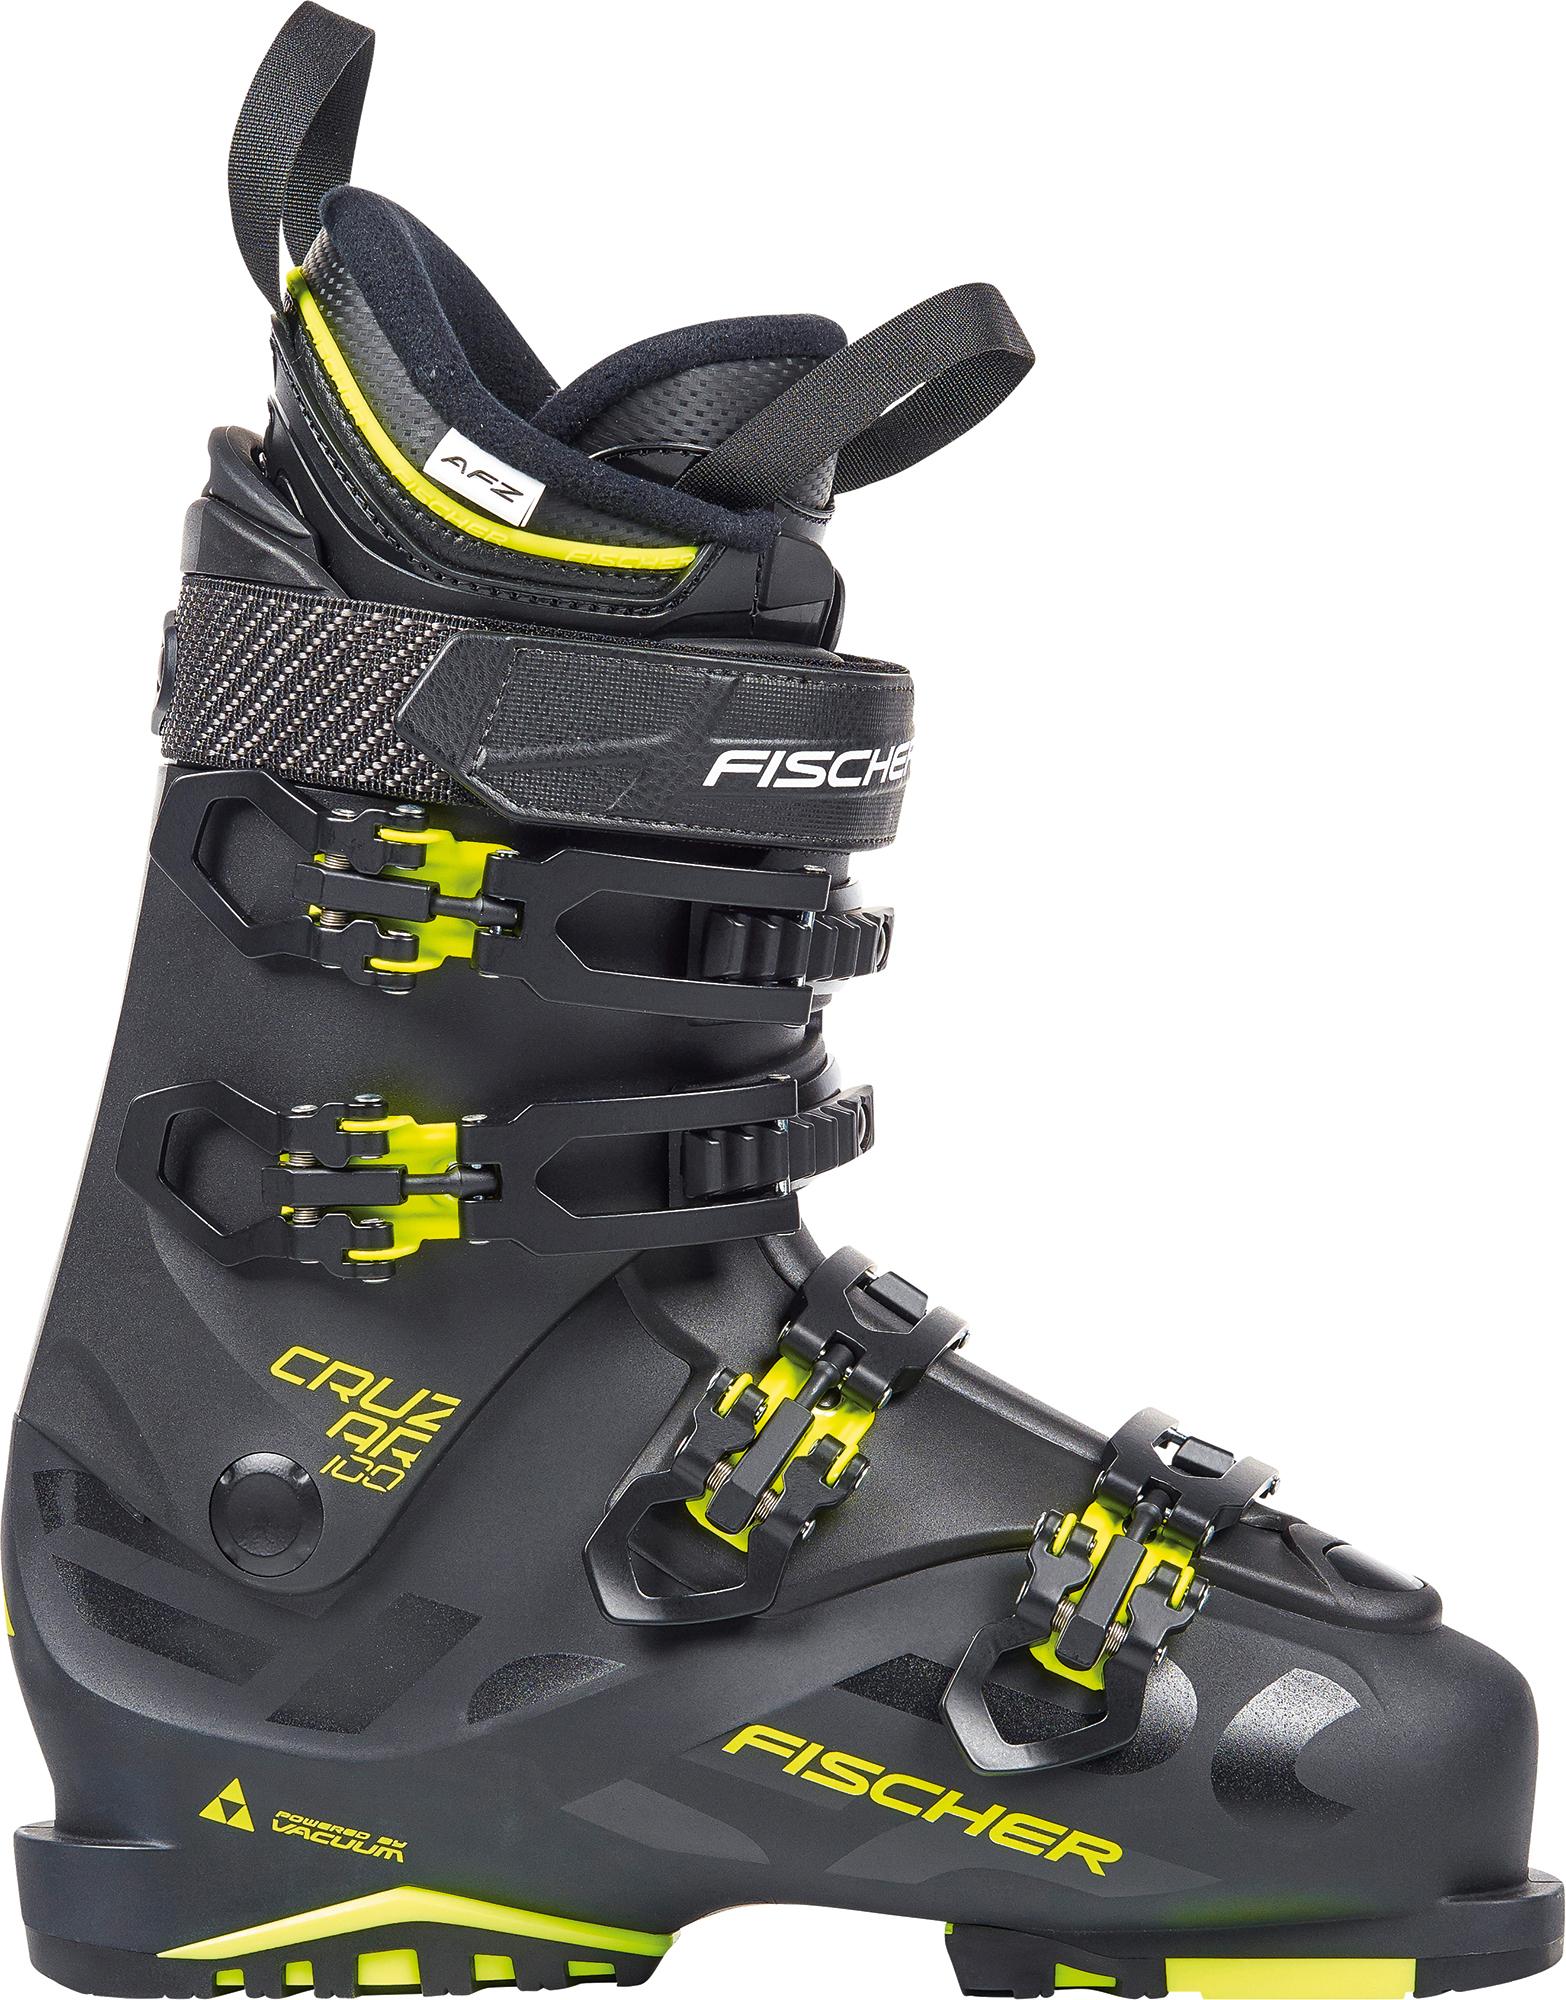 Fischer Ботинки горнолыжные Cruzar 100 Pbv, размер 31,5 см